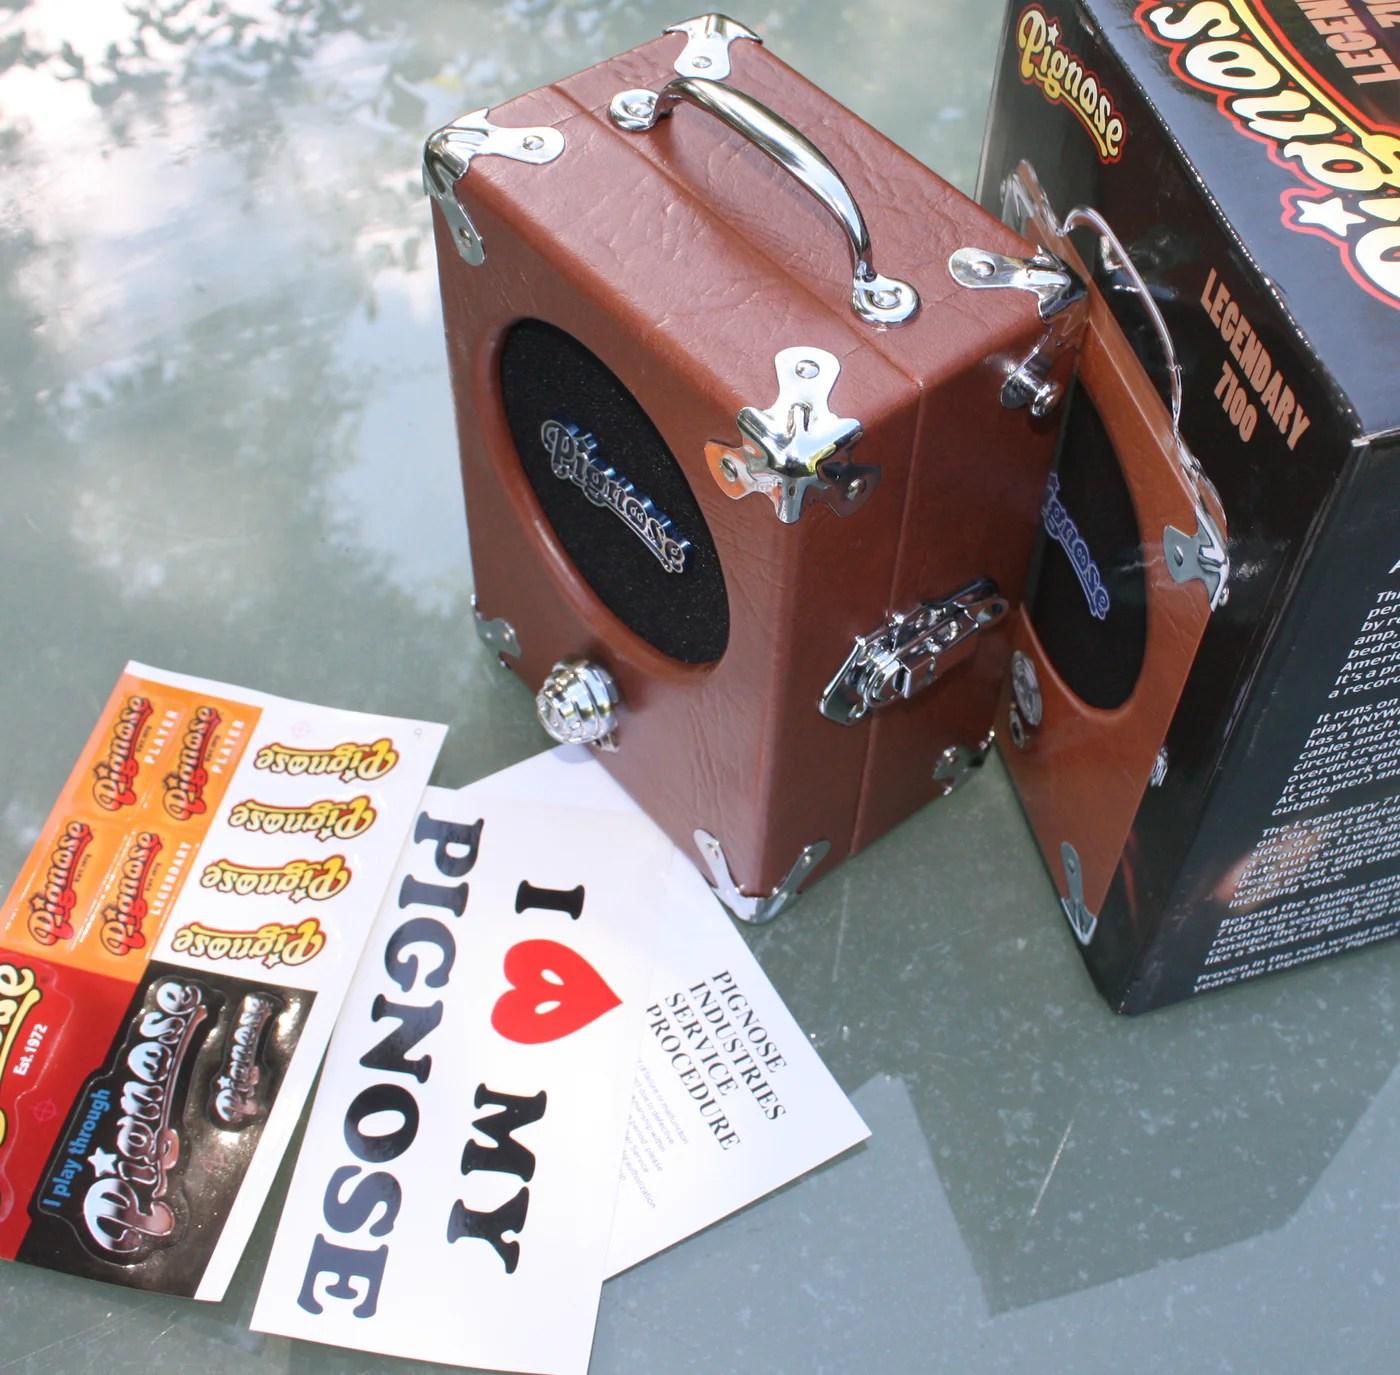 the legendary pignose 7 100 battery amp [ 1400 x 1375 Pixel ]